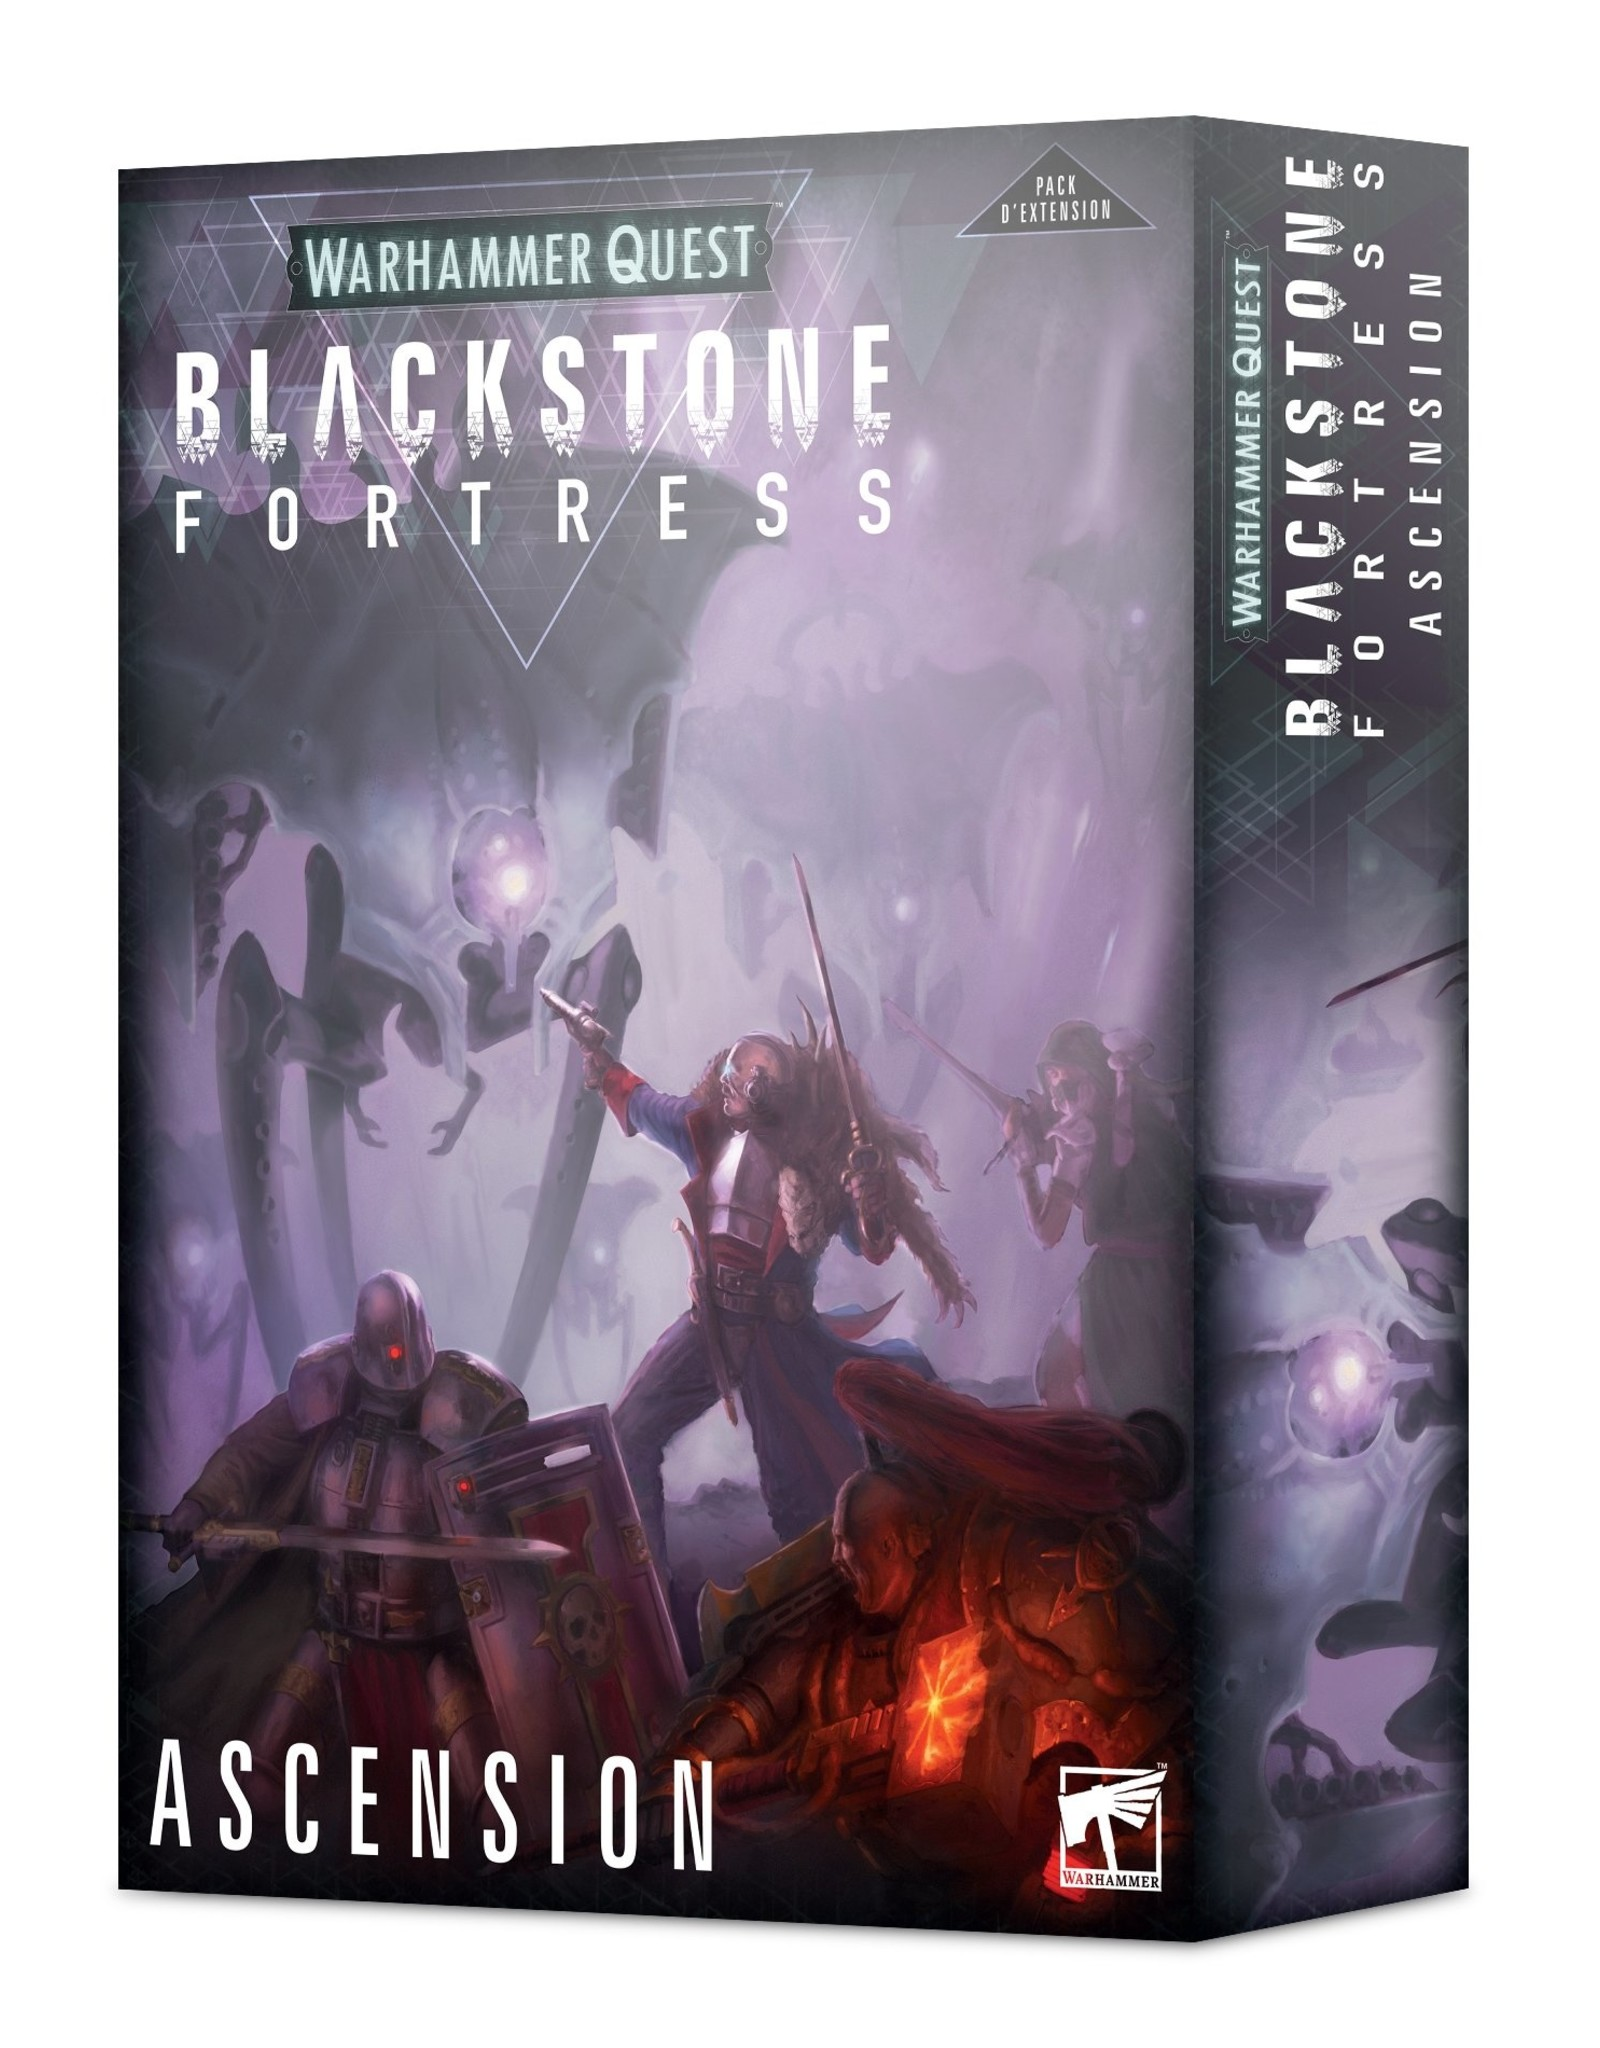 Games Workshop Warhammer Quest Blackstone Fortress: Ascension